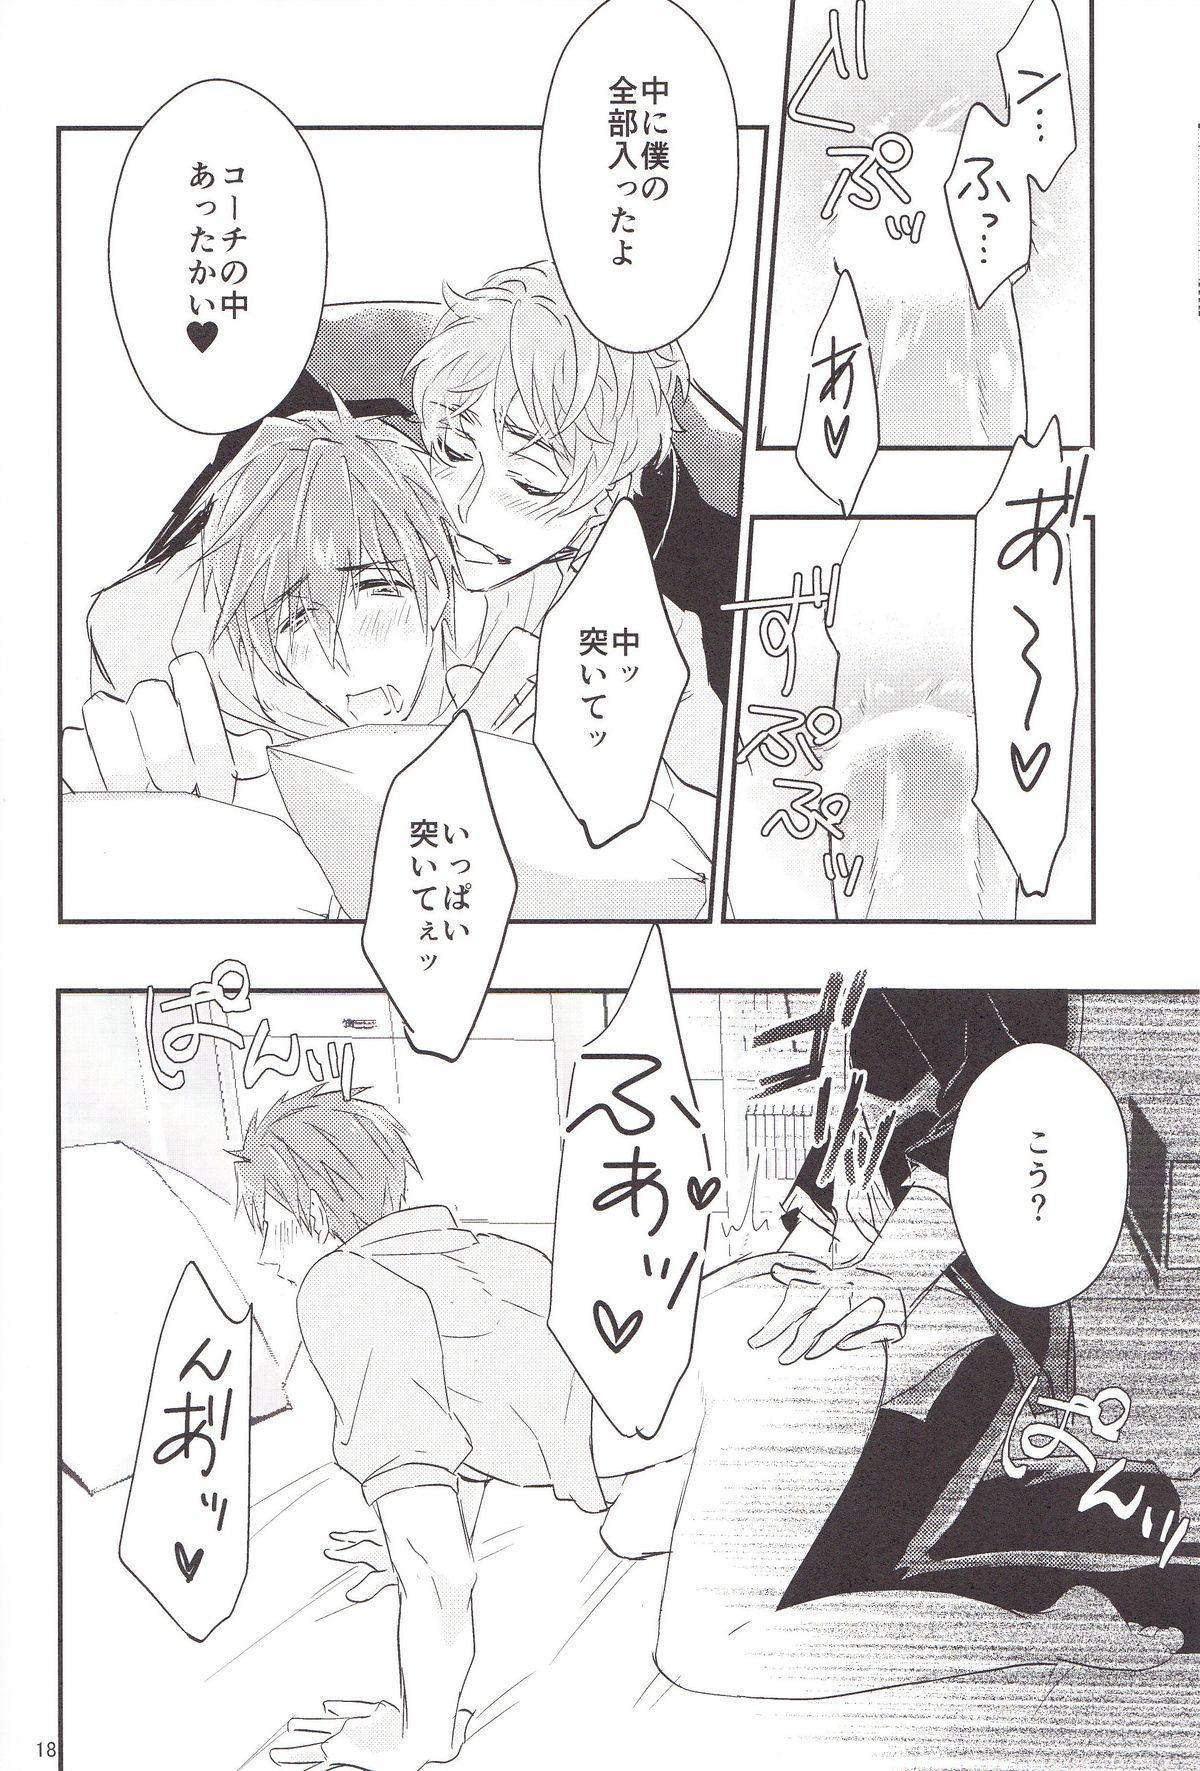 Tachibana Coach no Kojin Lesson 16